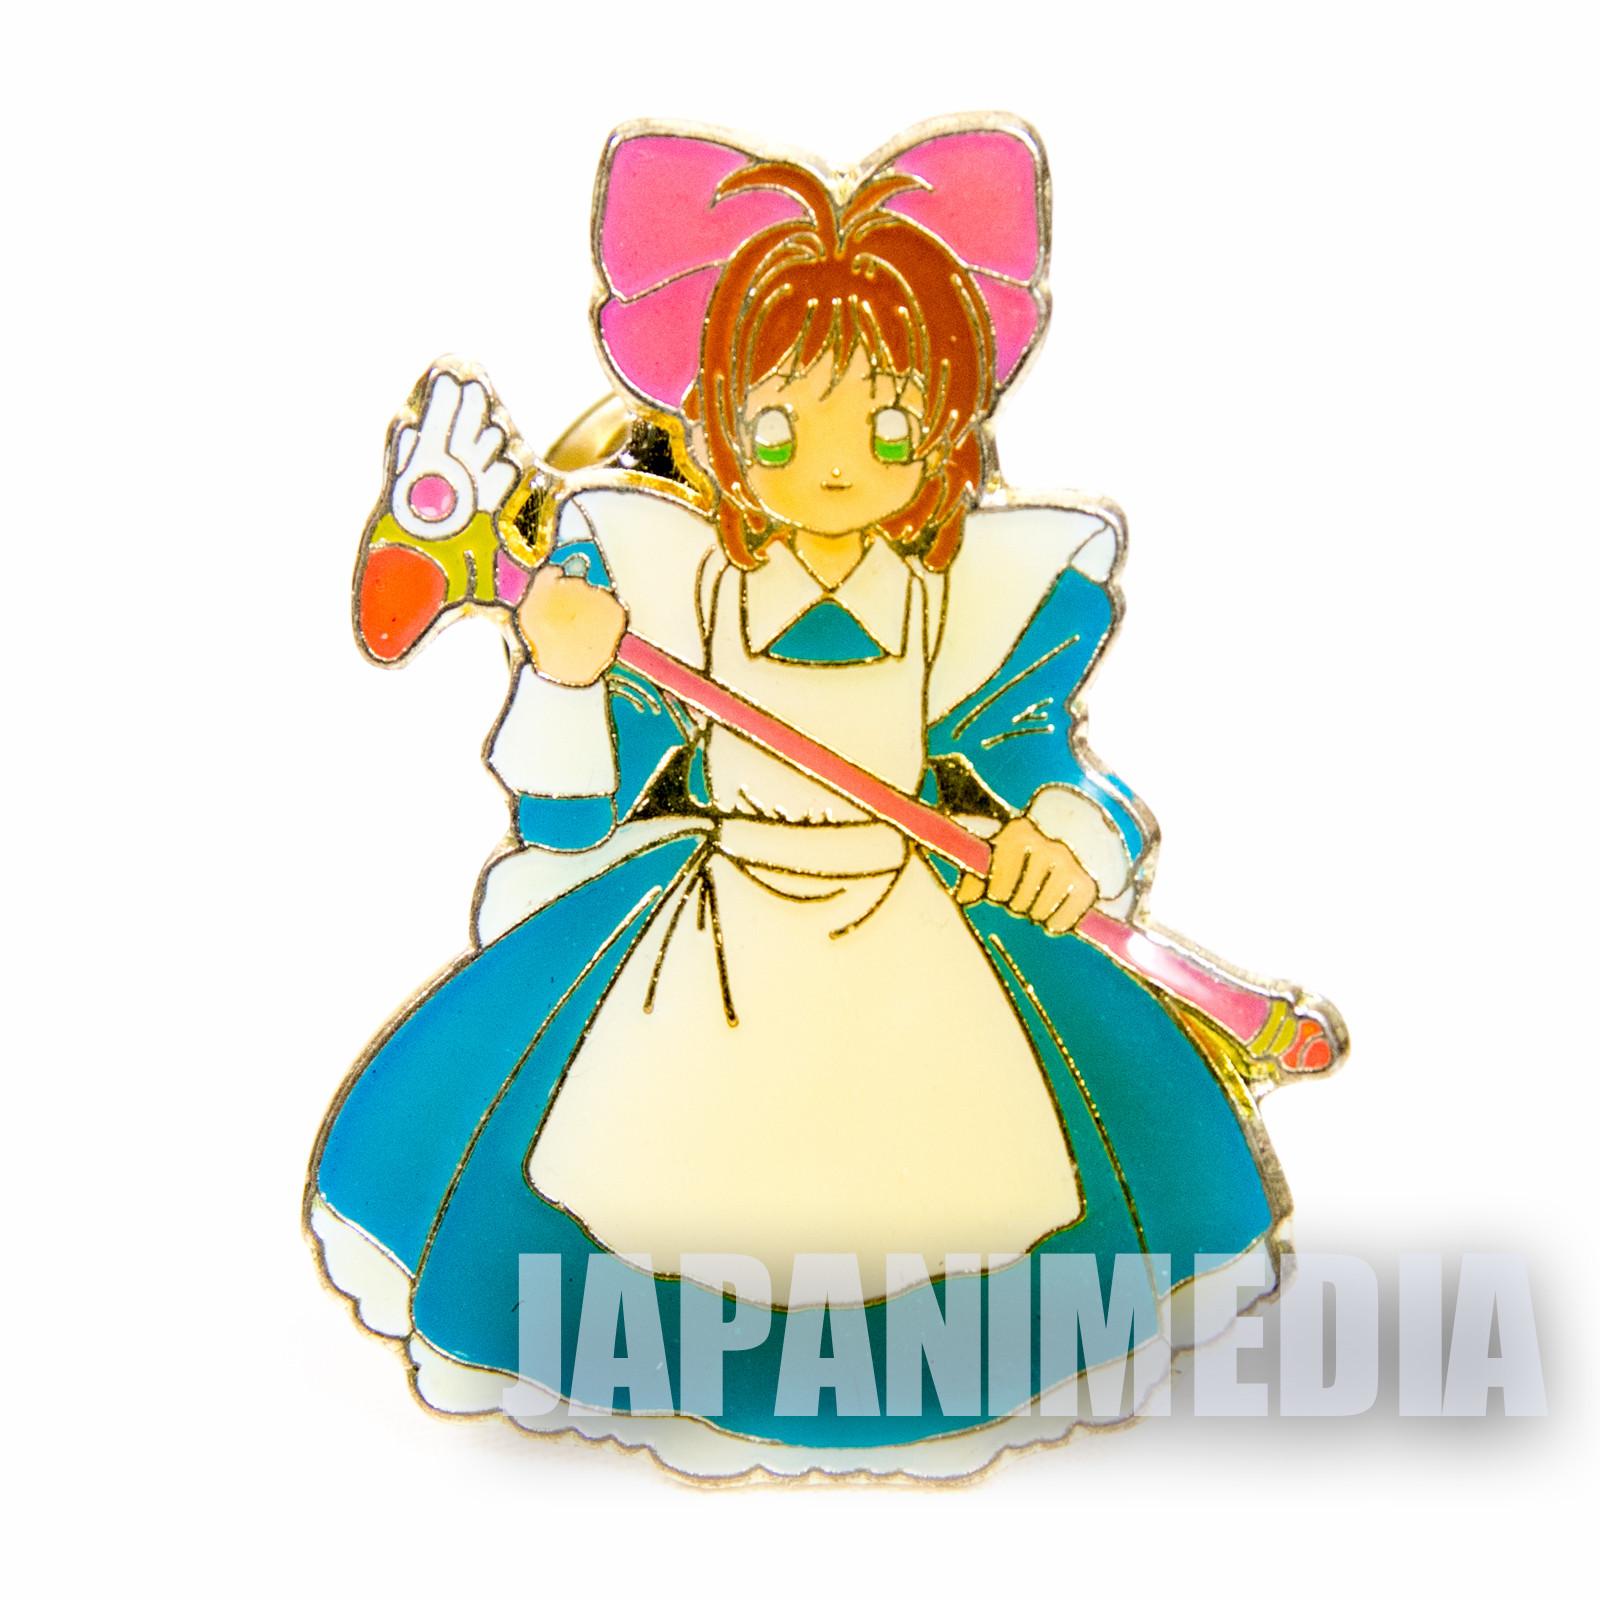 Cardcaptor Sakura Kero-chan & Spinel Sun Sakura Pins CLAMP JAPAN ANIME #19